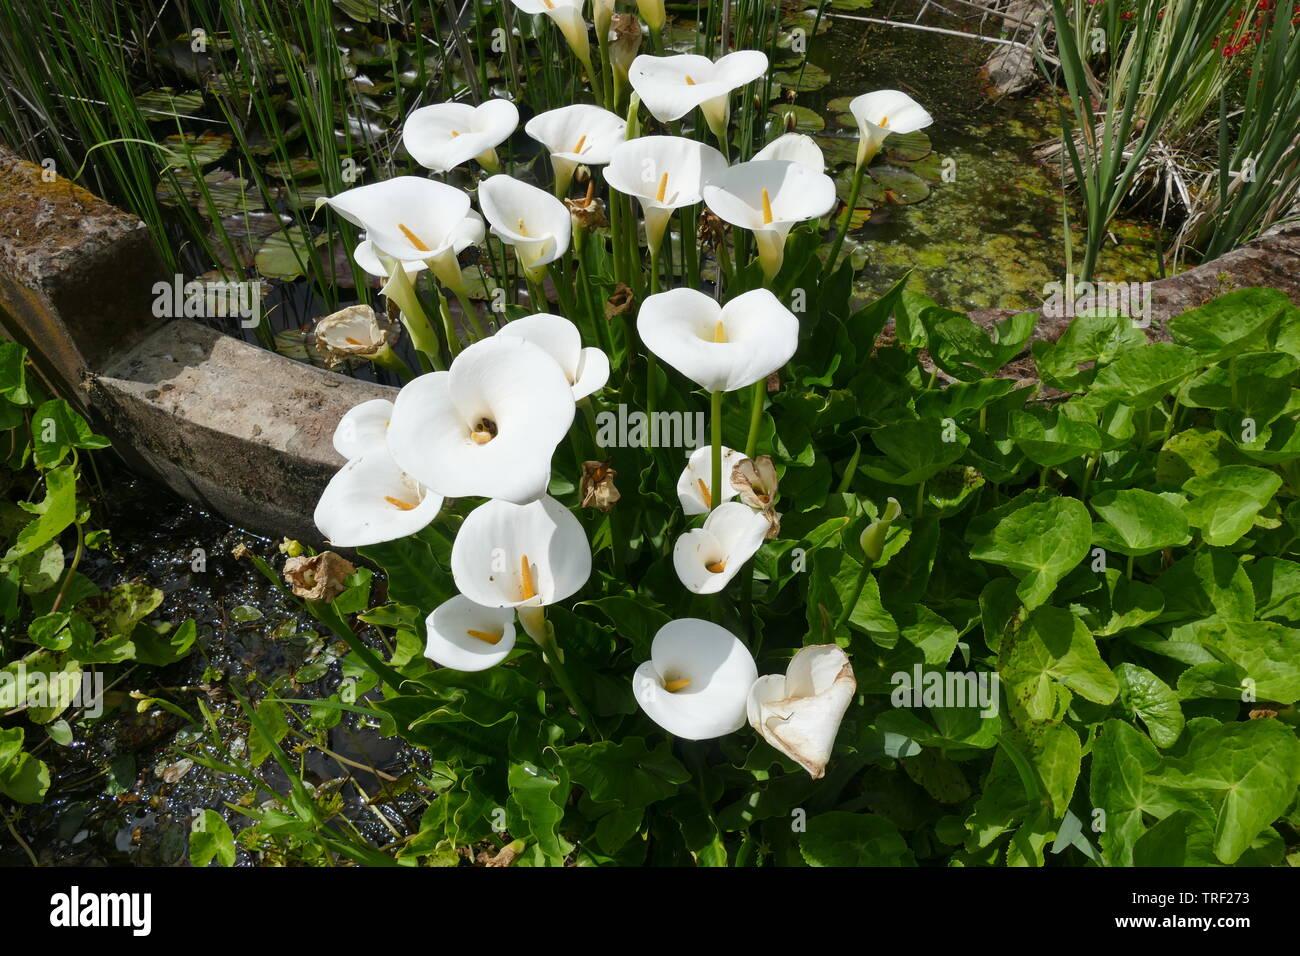 Calla Lily Growing Wild Stock Photo 255413287 Alamy